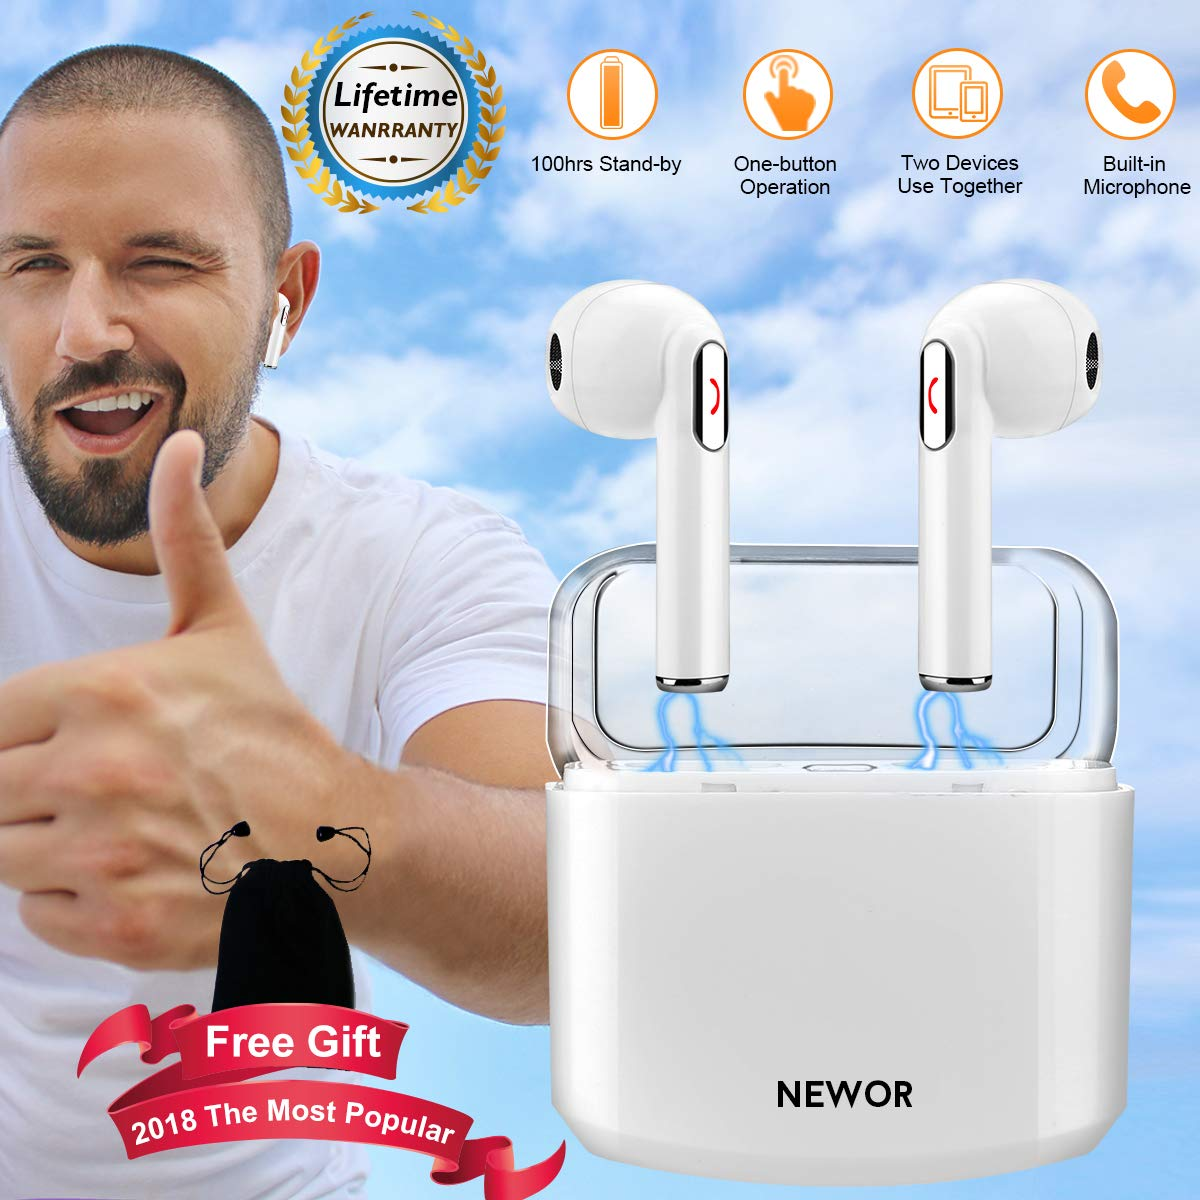 Wireless Earbuds Bluetooth Headphones Stereo Bluetooth Earbud Wireless Earphones Mini In-Ear Headphones Sweatproof Sport Earbud Noise Cancel Mic Charging Case (White)